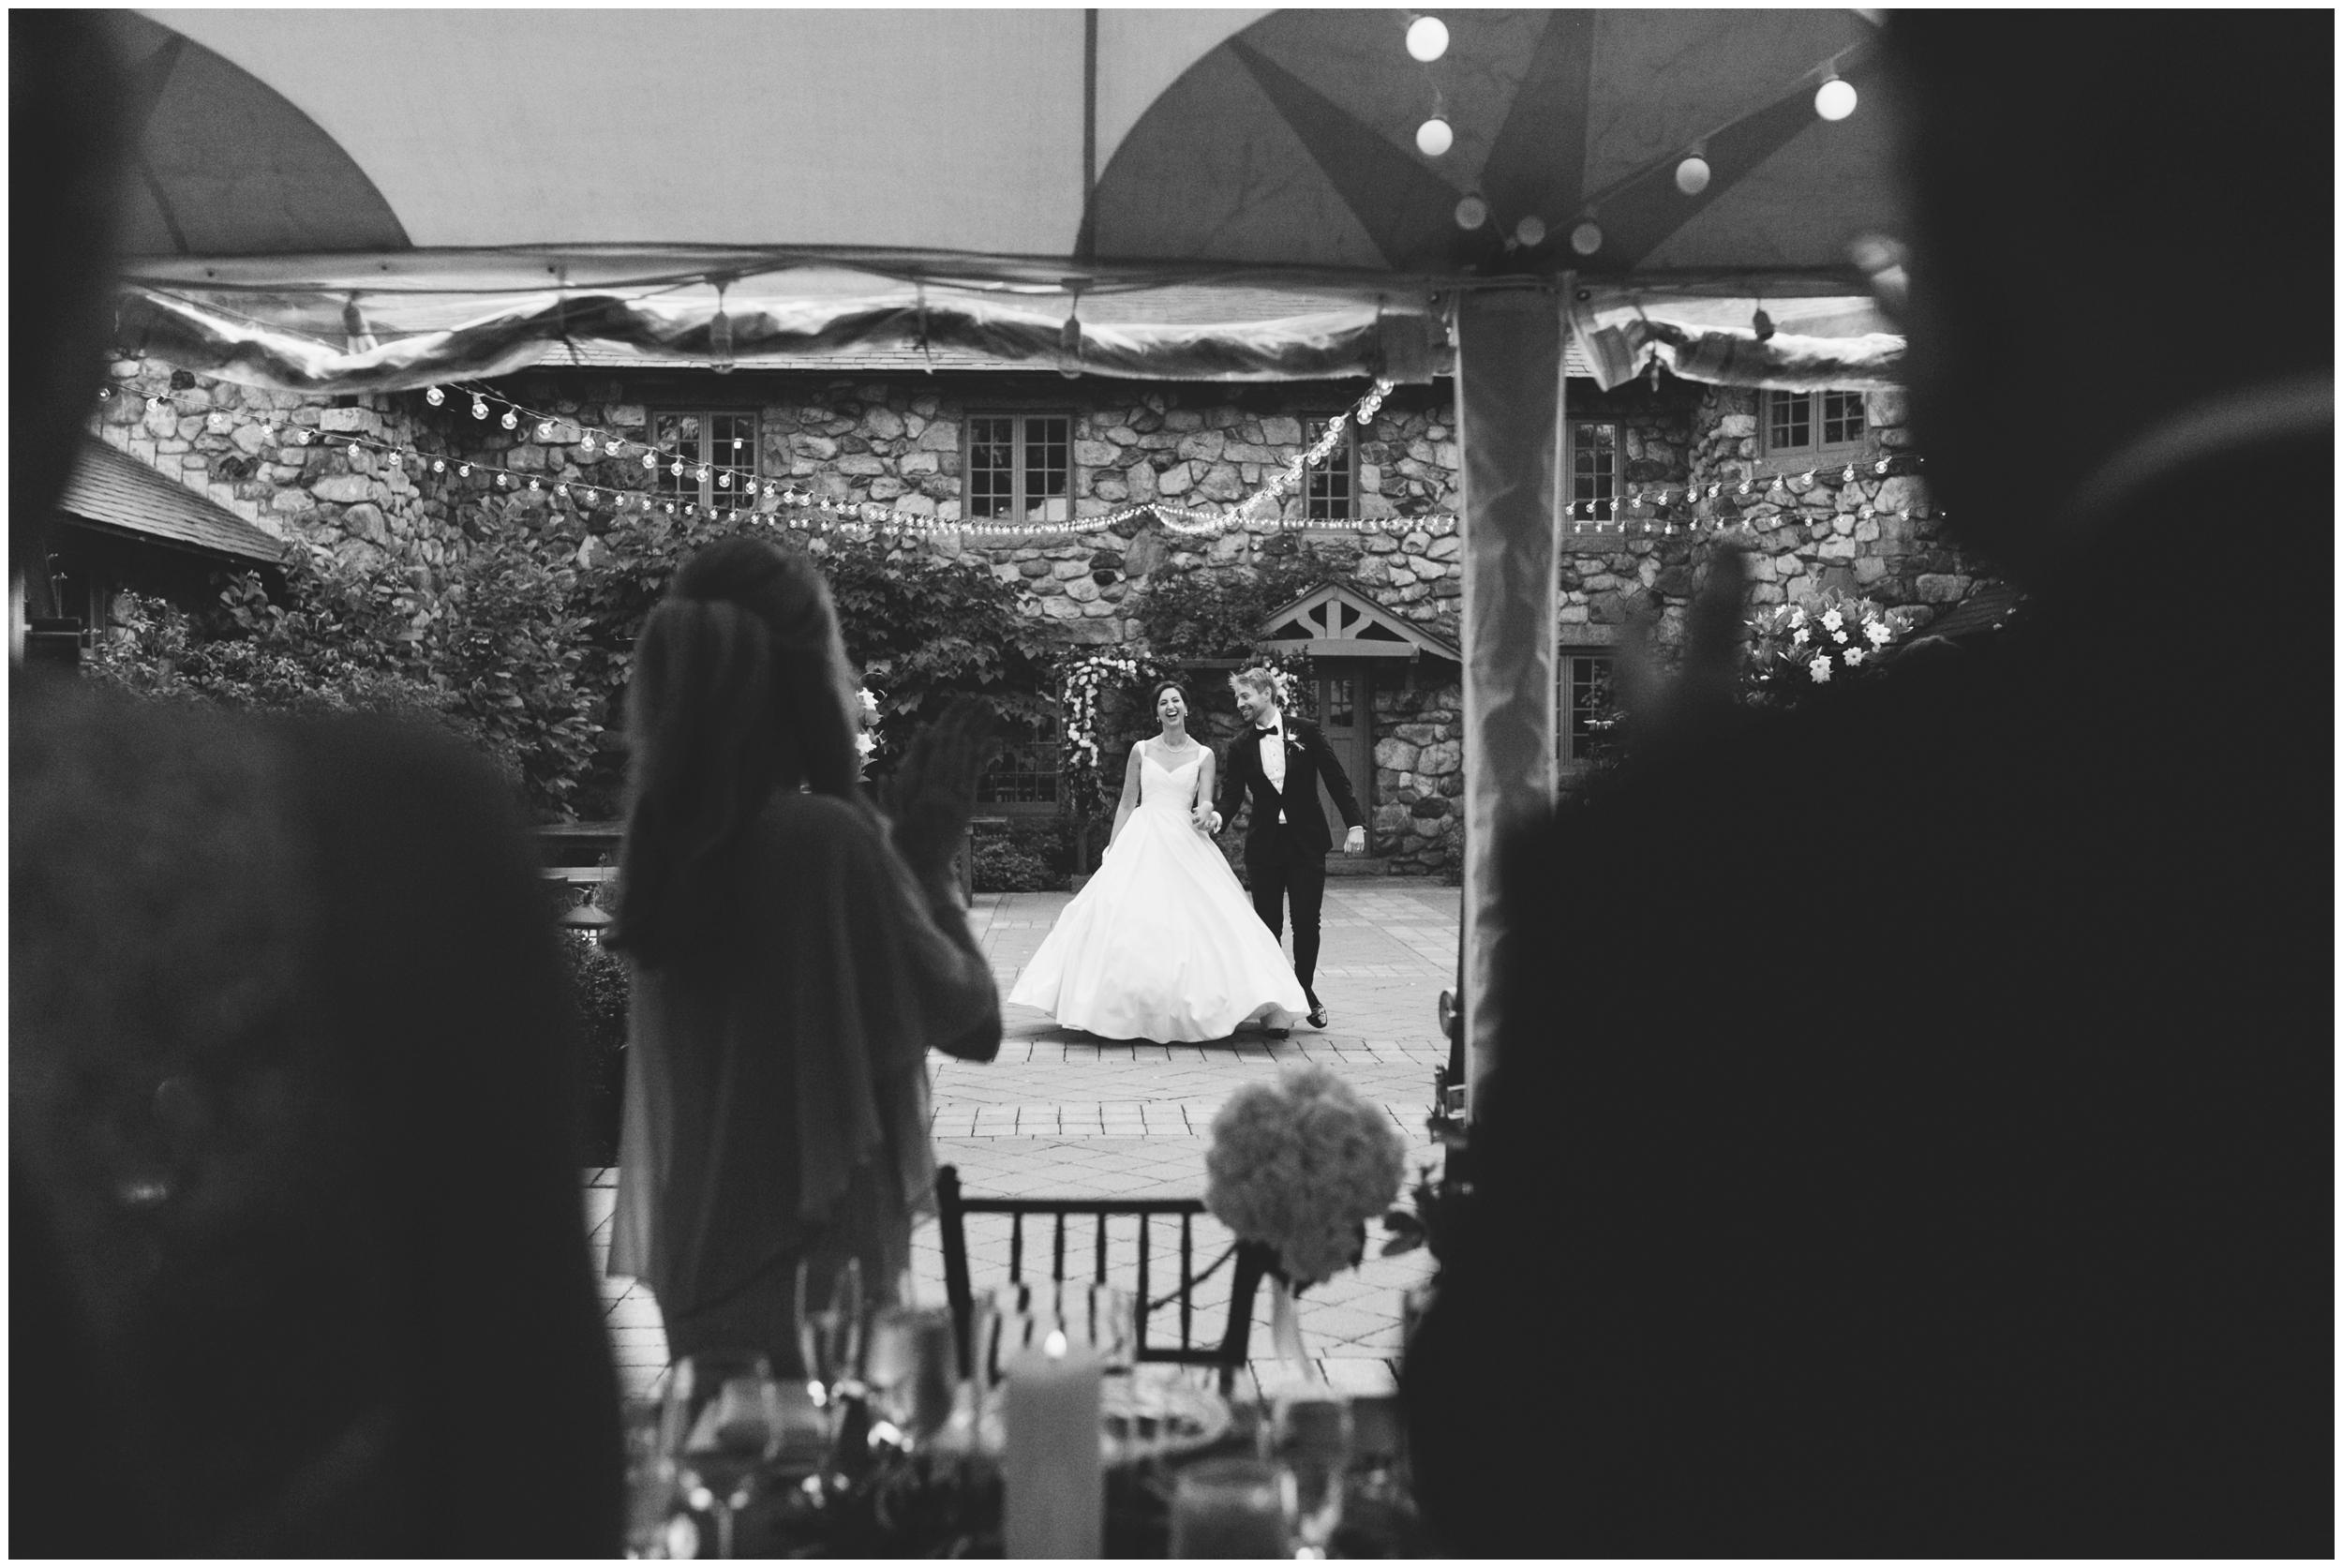 Willowdale-Estate-Wedding-Bailey-Q-Photo-Boston-Wedding-Photographer-075.JPG